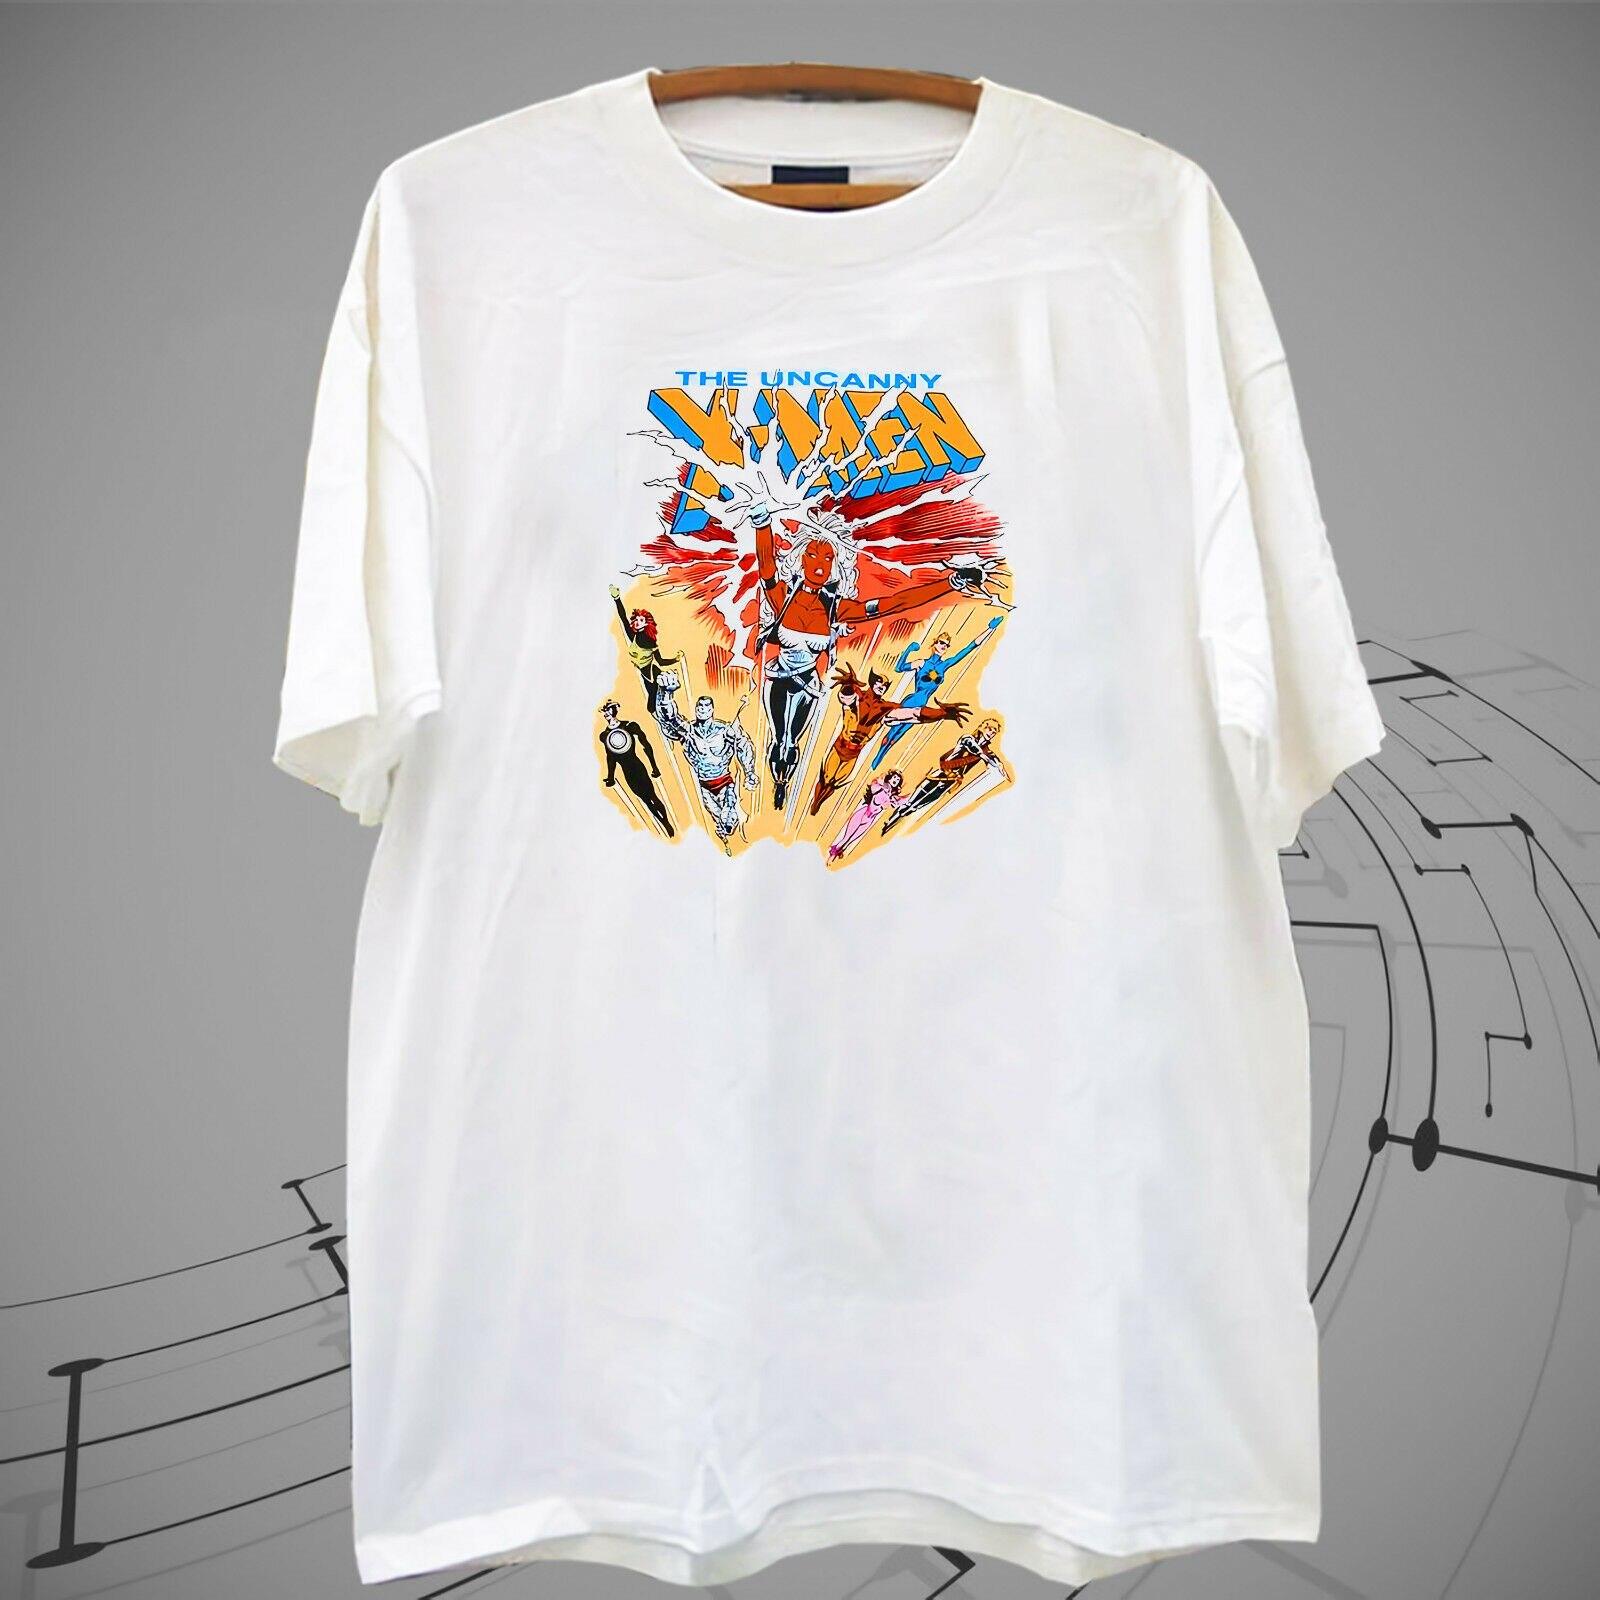 ¡Nuevo! VTG vtg 80 s 1988 The Uncanny X-MEN camiseta blanca camiseta nueva marca-ropa camiseta top